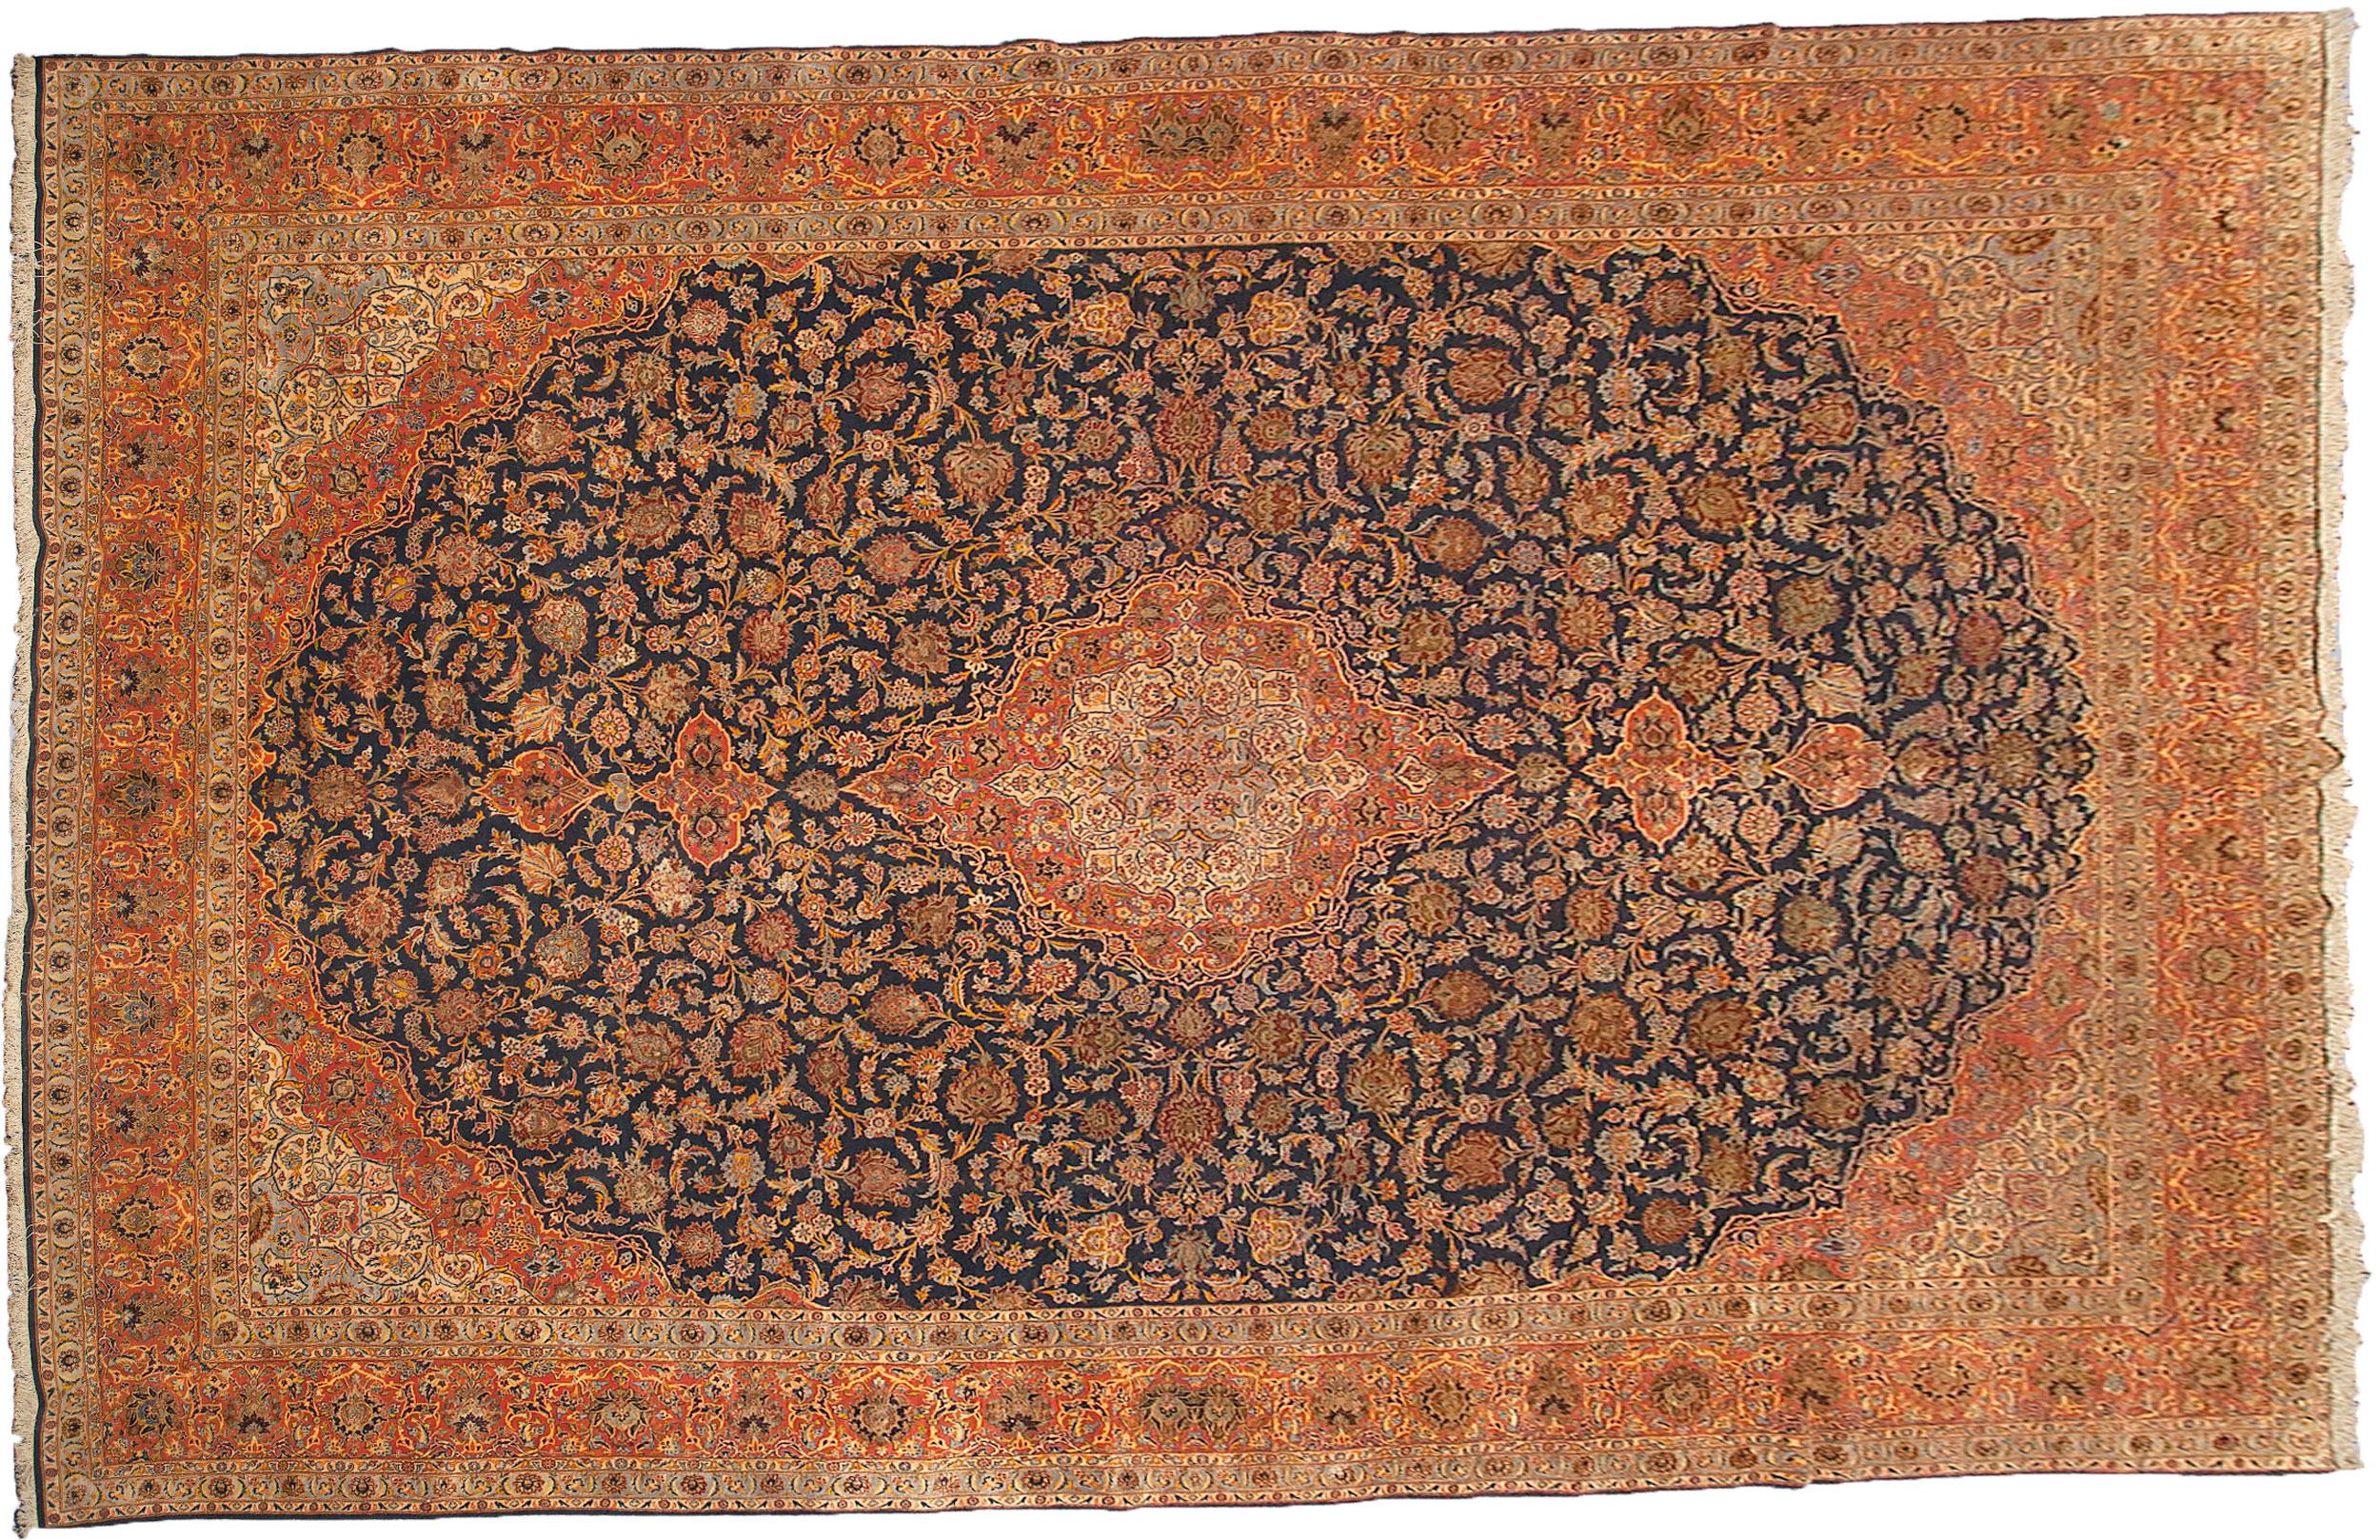 Vintage Part Silk Kashan Carpet 577x375cm